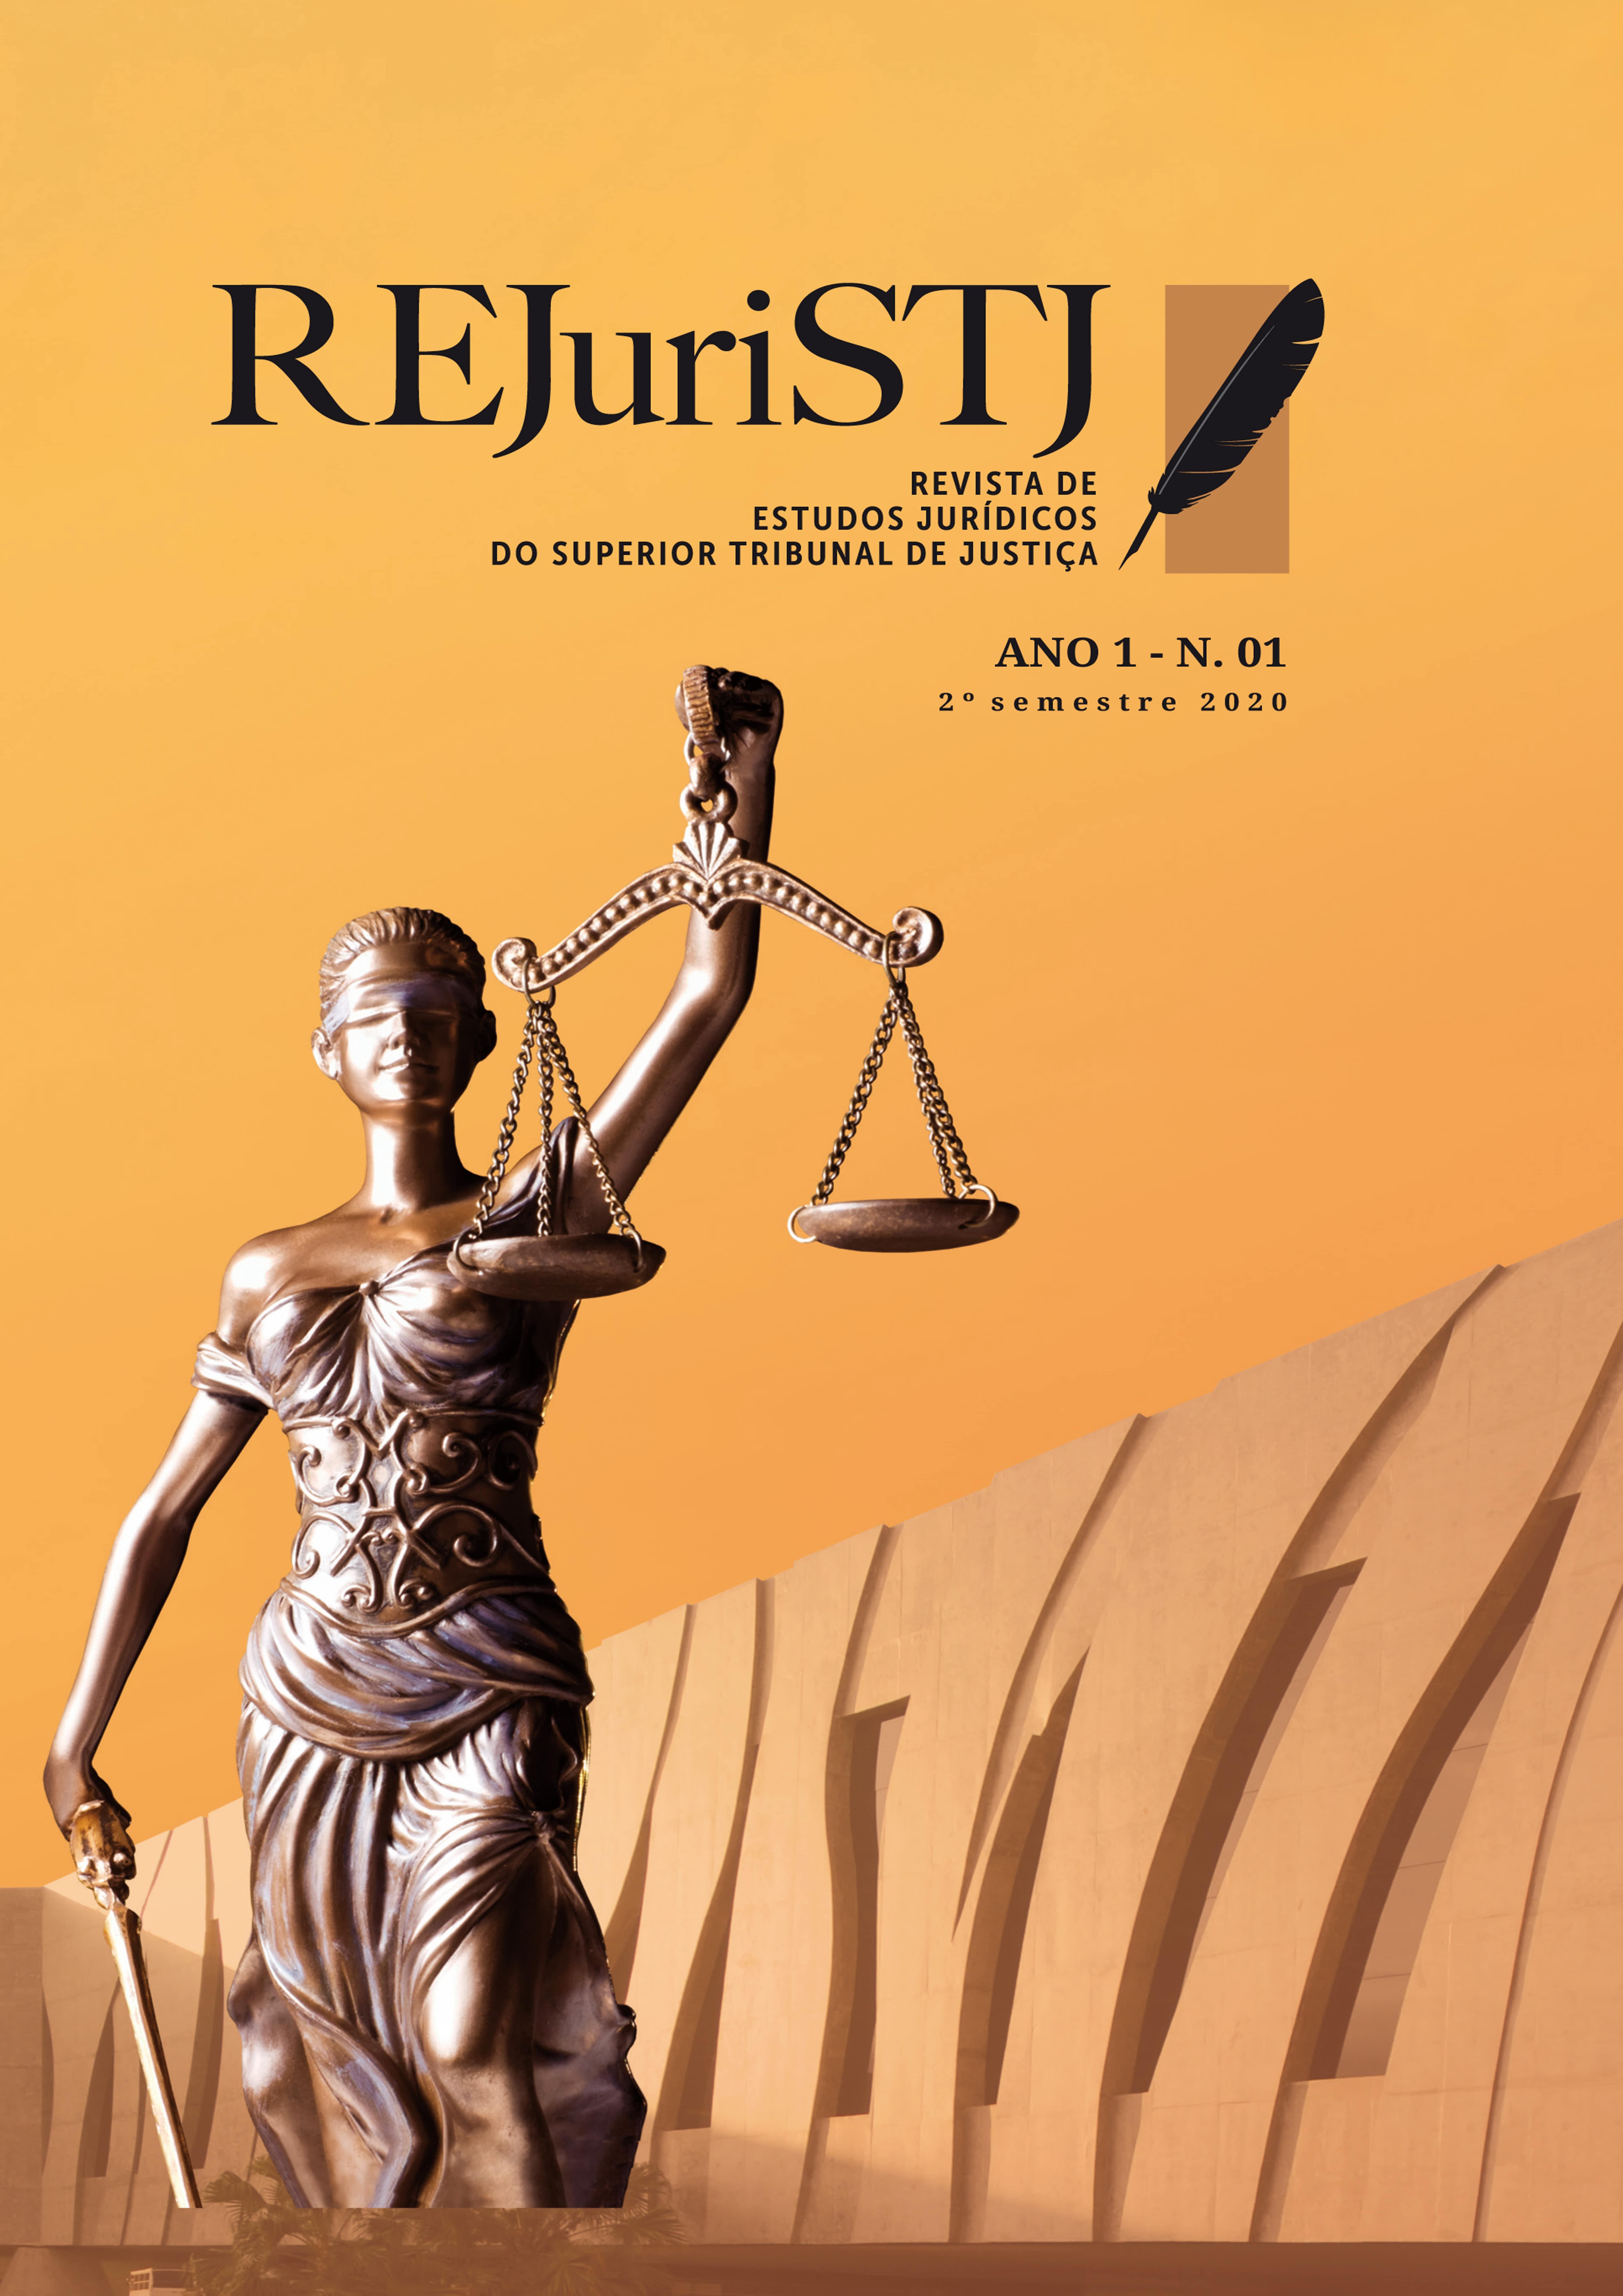 Capa da 1ª edição Rejuri STJ